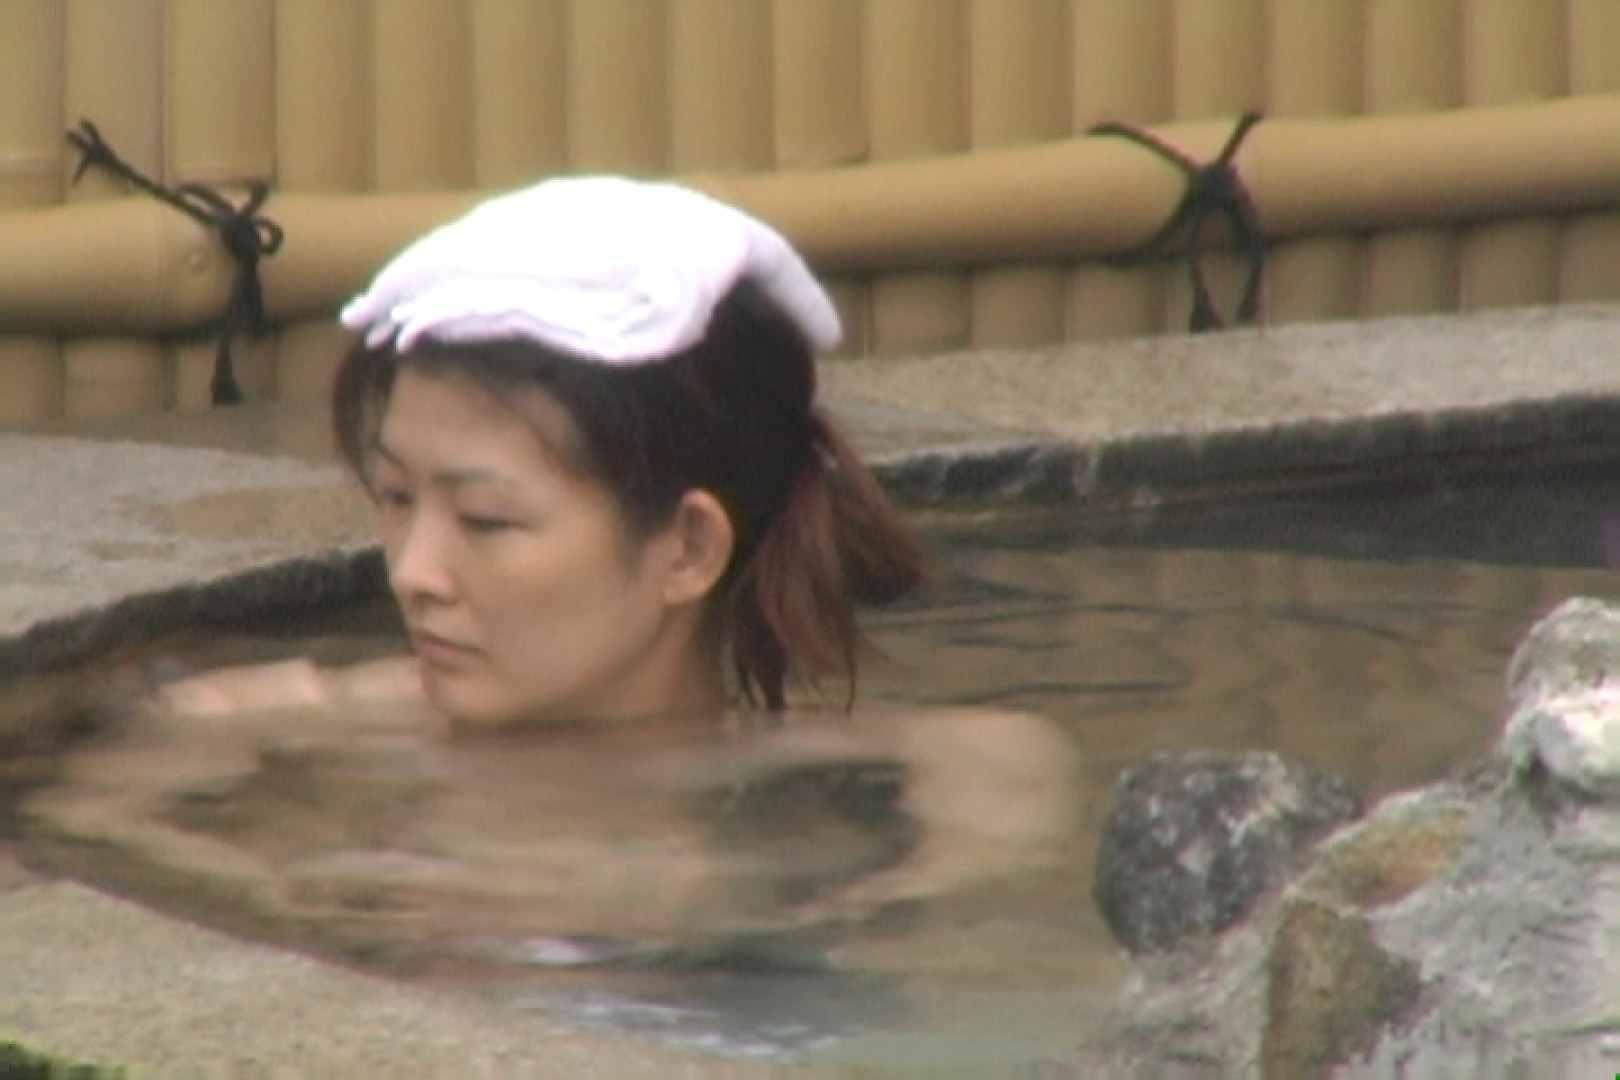 Aquaな露天風呂Vol.611 露天風呂編 | 盗撮シリーズ  97PIX 21